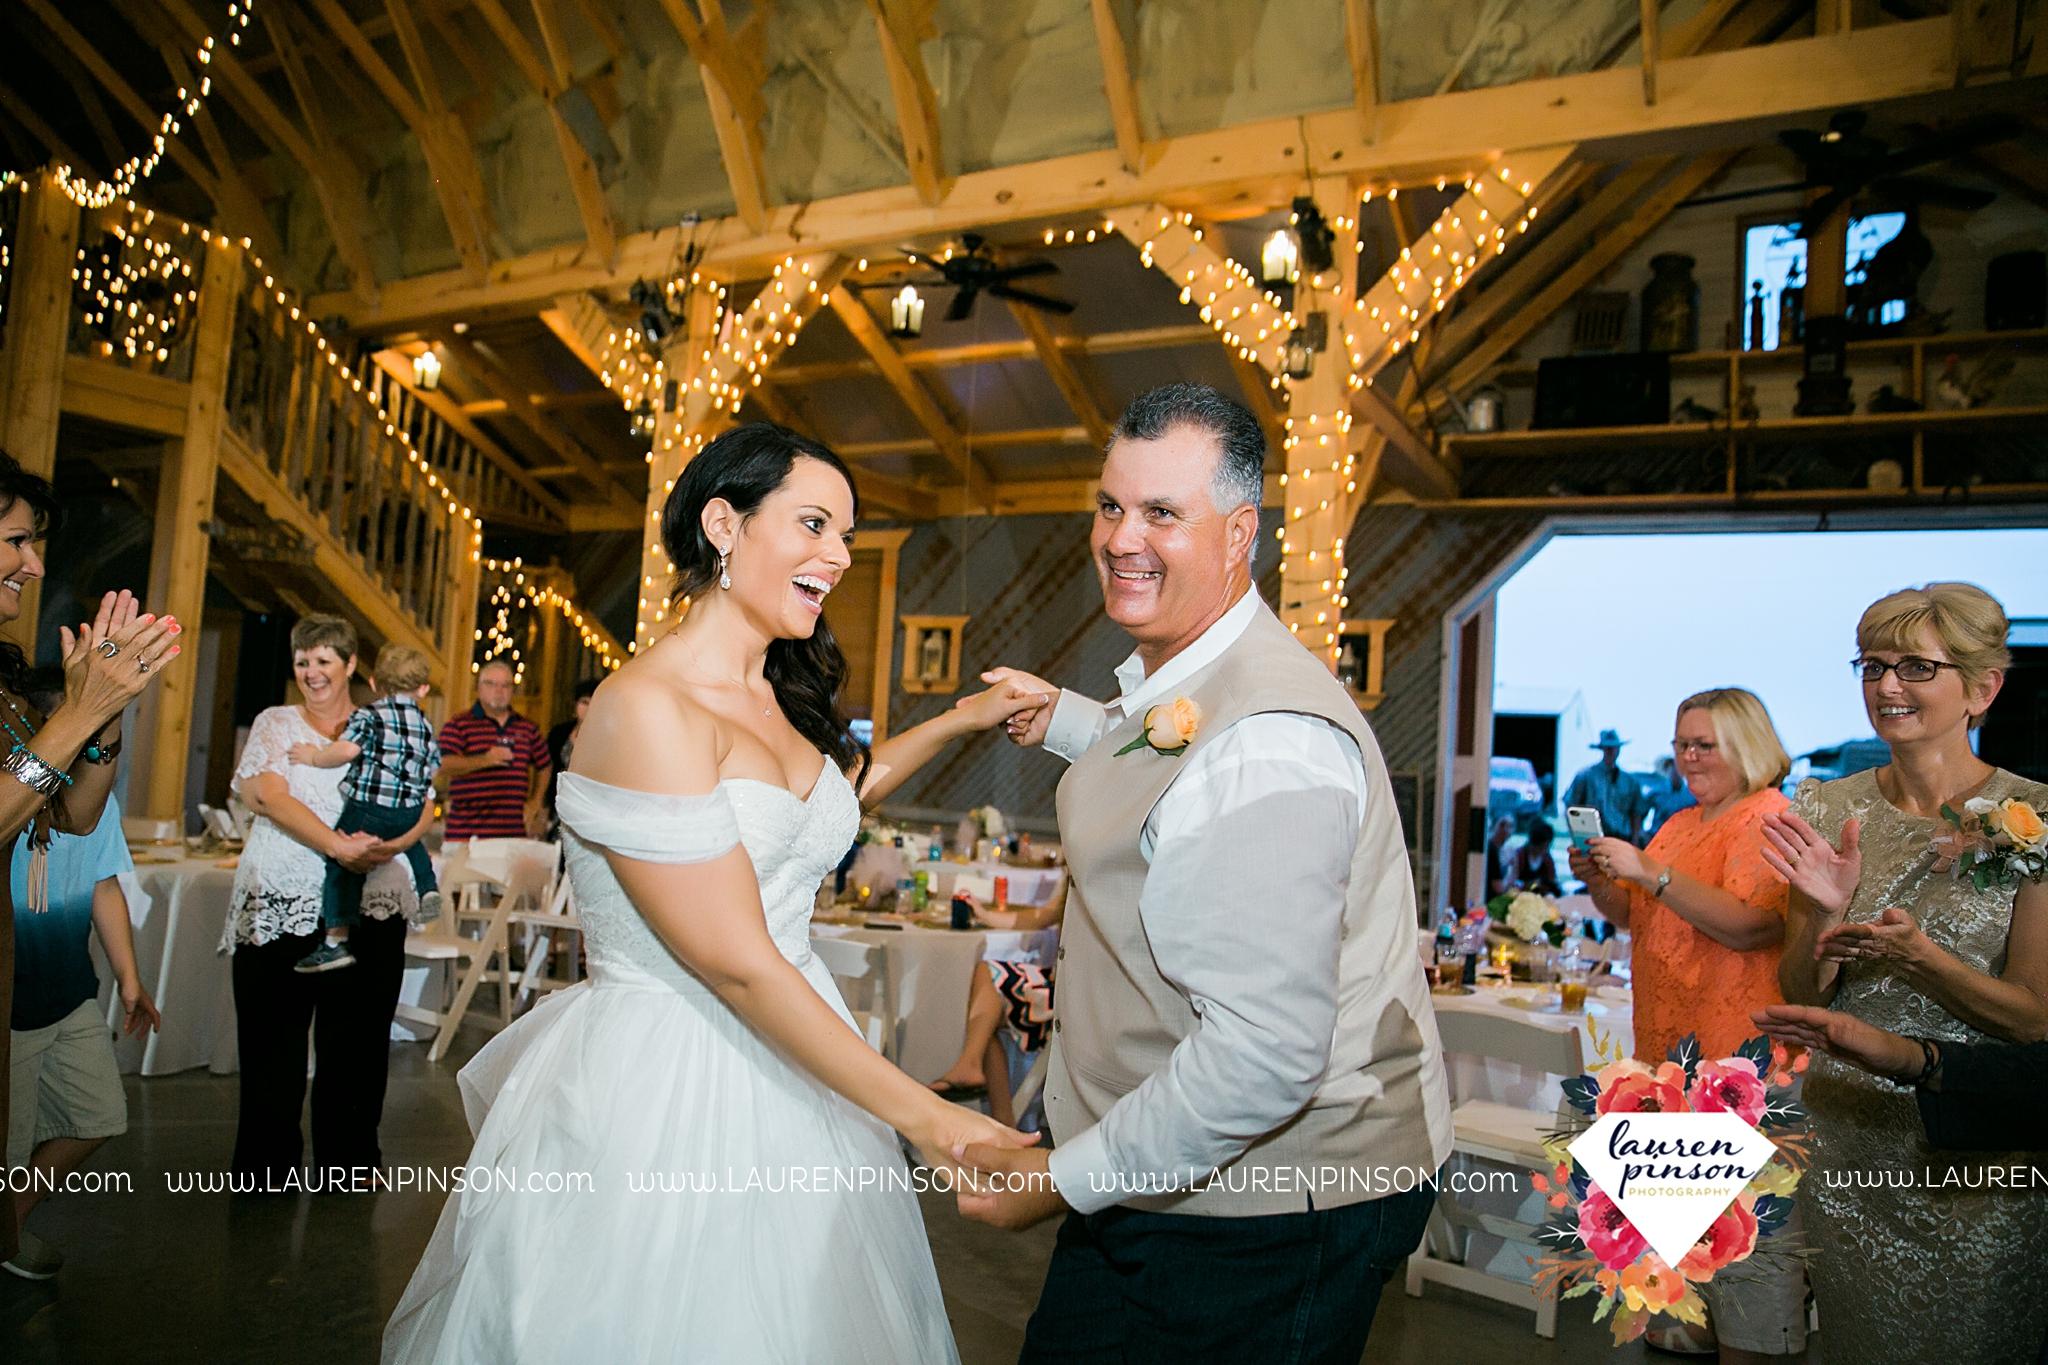 jones-barn-willow-creek-ranch-wedding-in-cleburne-texas-fort-worth-dfw-wichita-falls-wedding-photography_3260.jpg